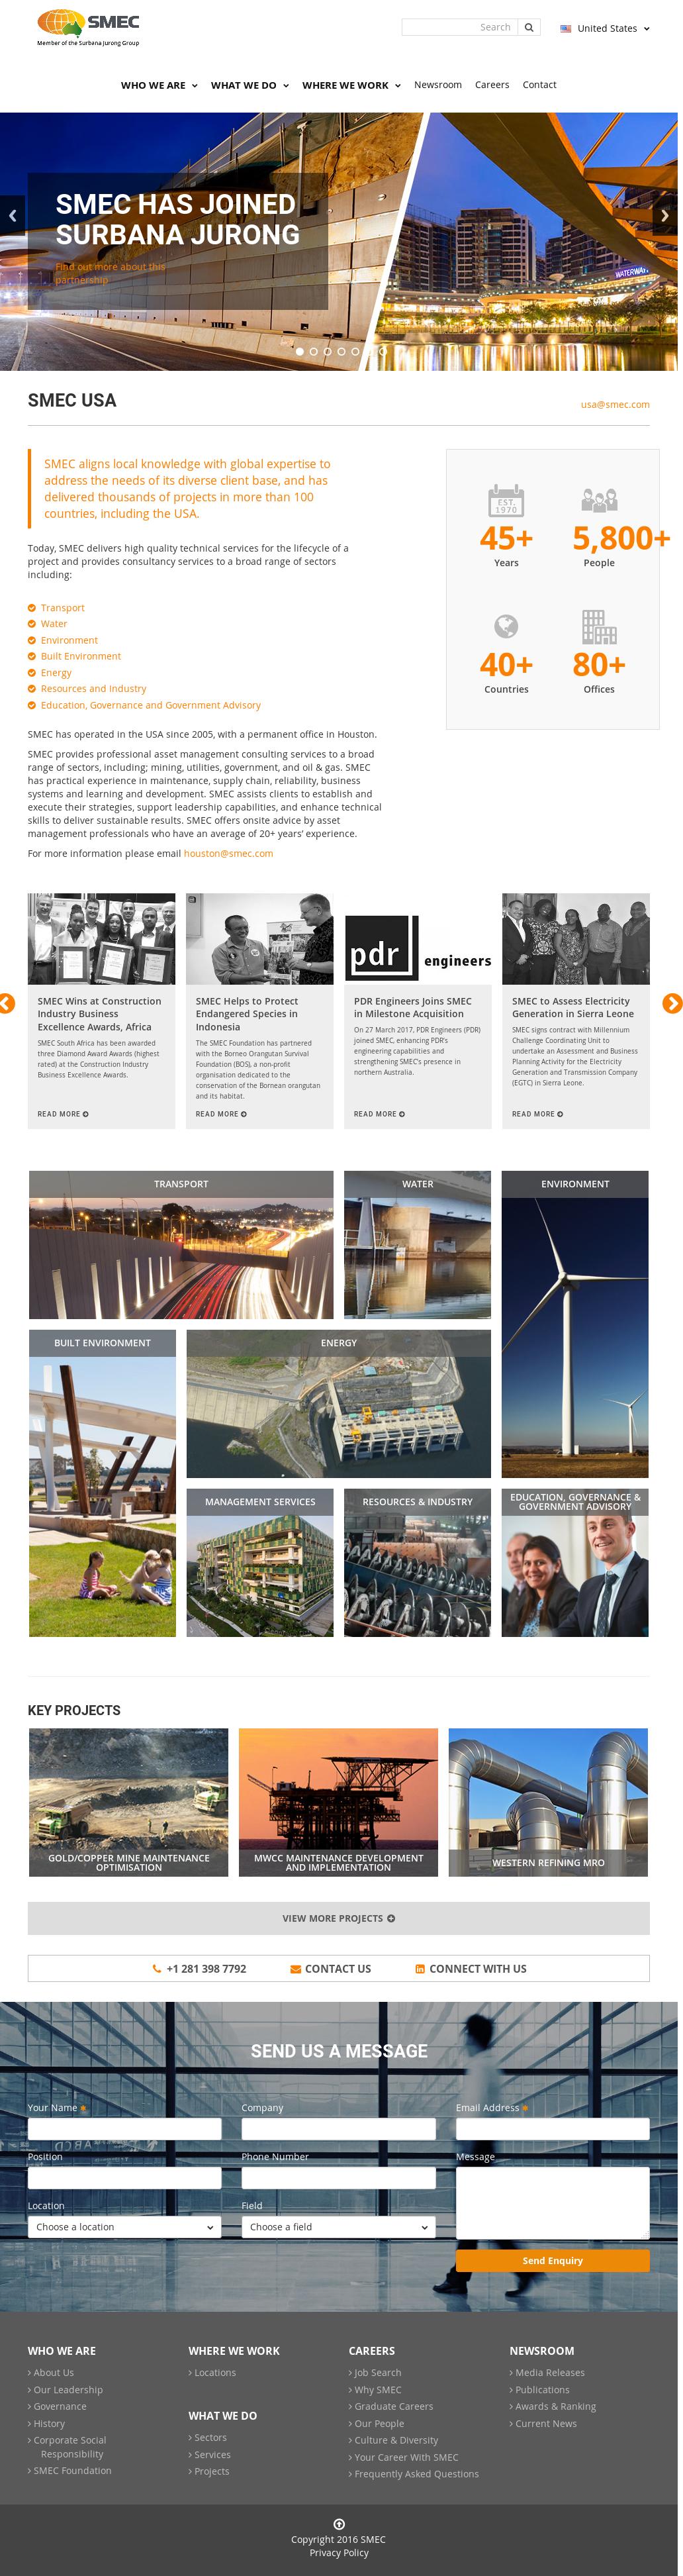 SMEC Competitors, Revenue and Employees - Owler Company Profile